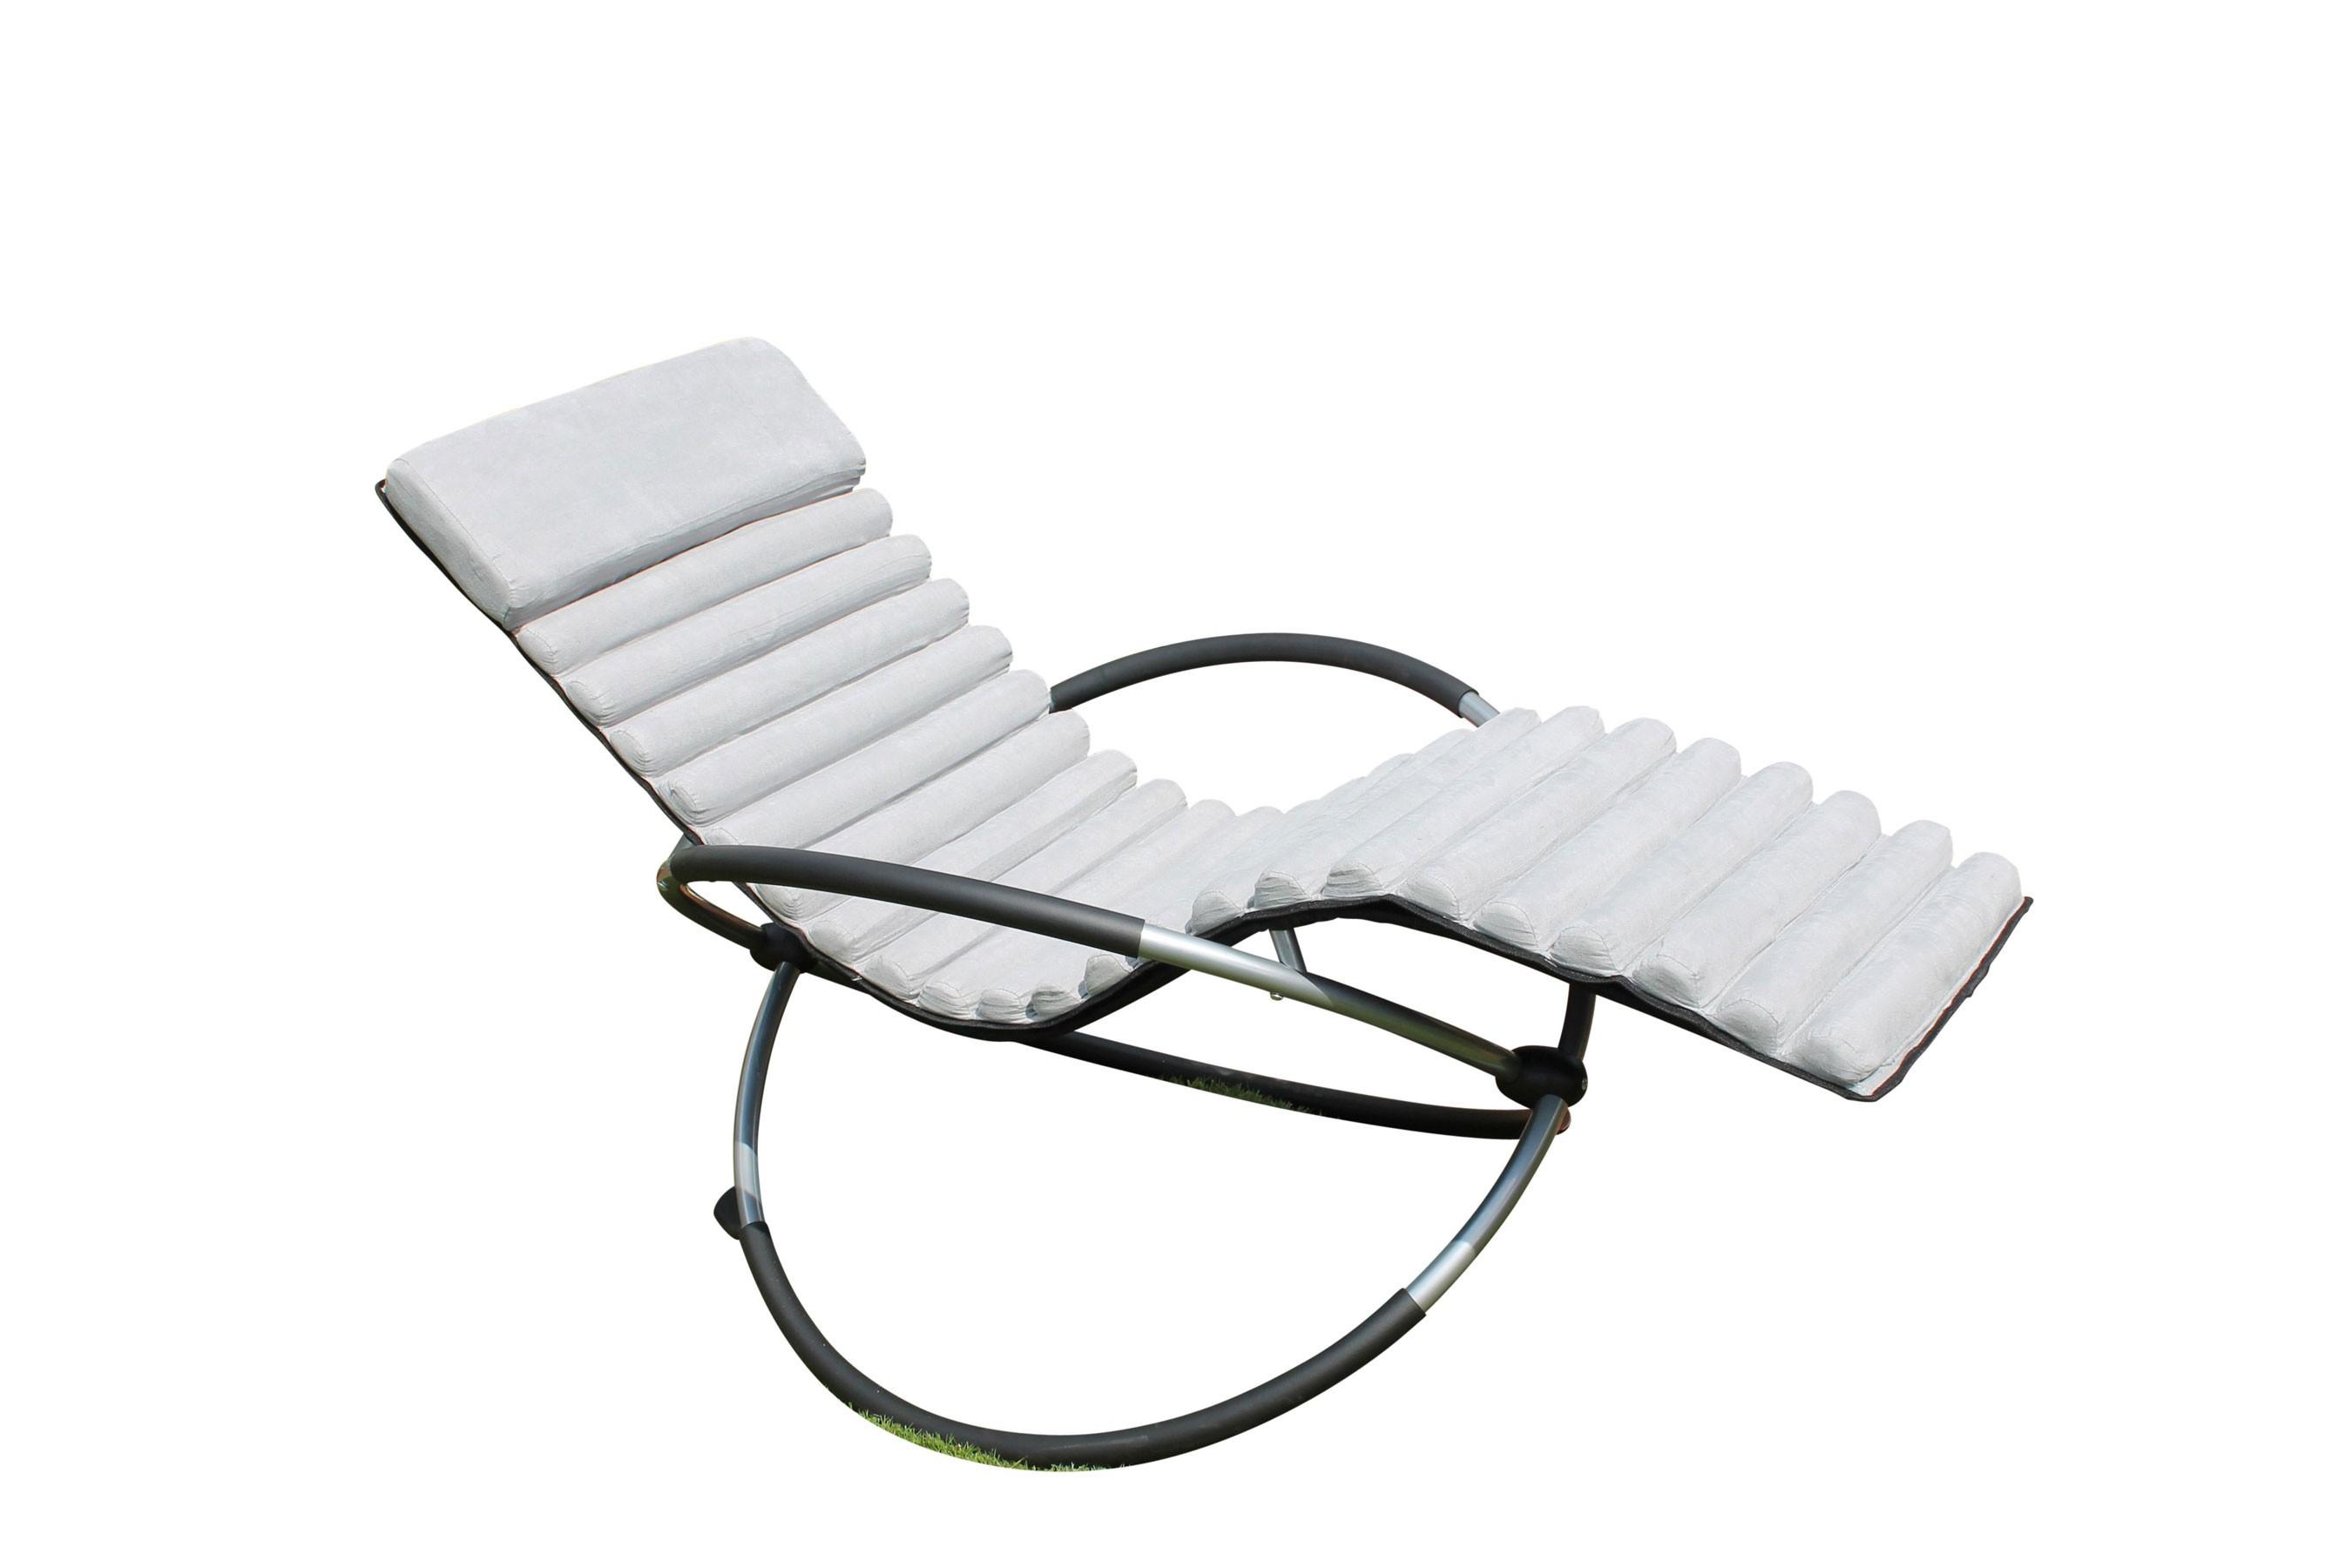 polster auflagen schaukelstuhlkissen f r leco schaukelstuhl grau bei. Black Bedroom Furniture Sets. Home Design Ideas